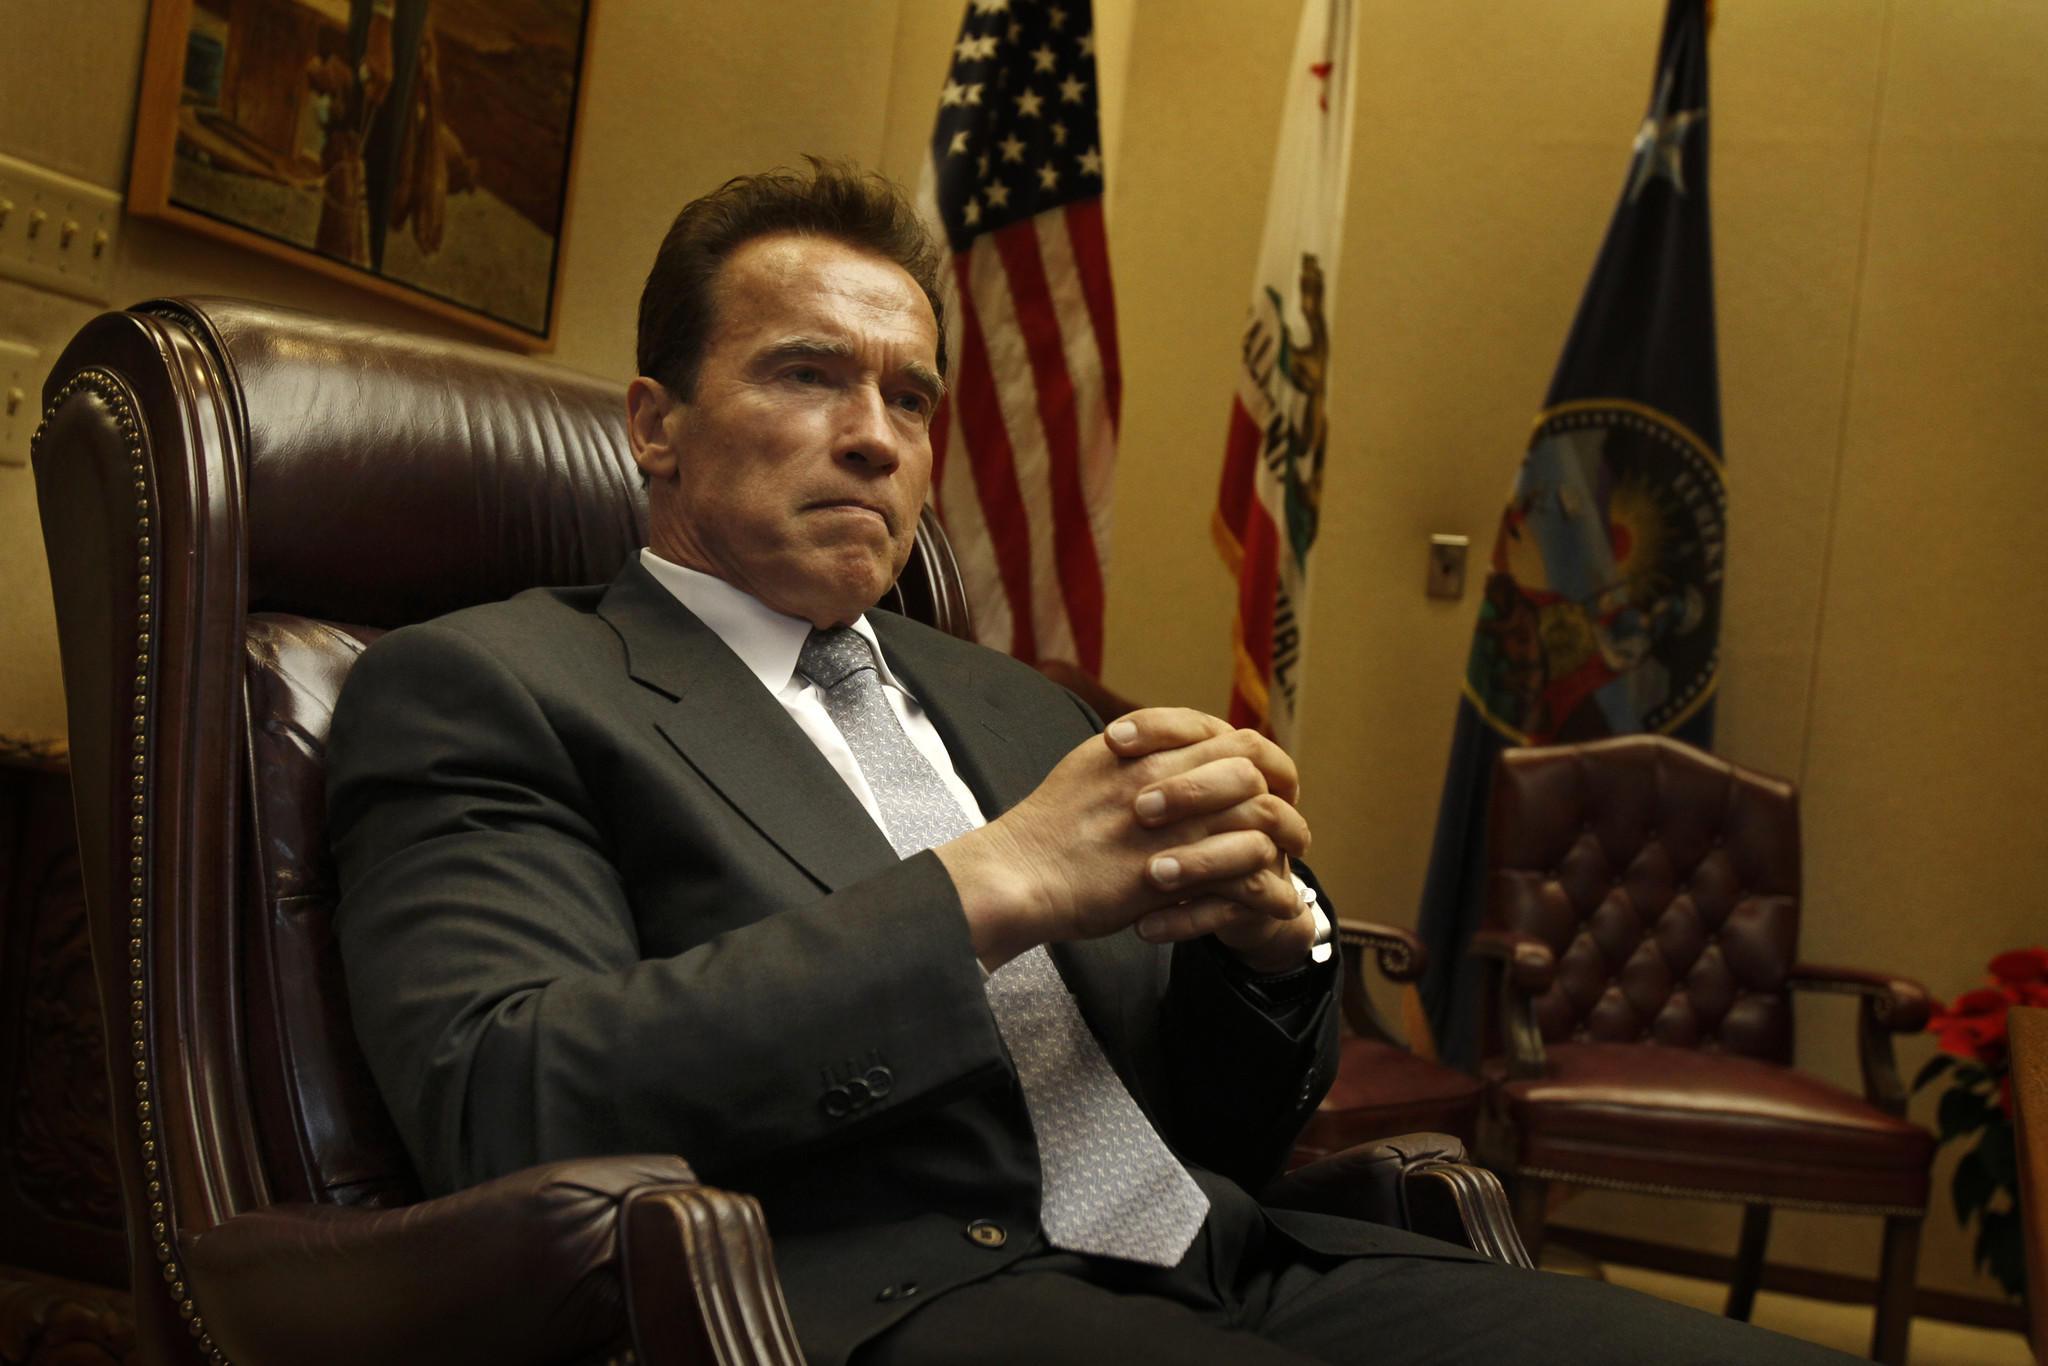 (Rick Loomis / Los Angeles Times)